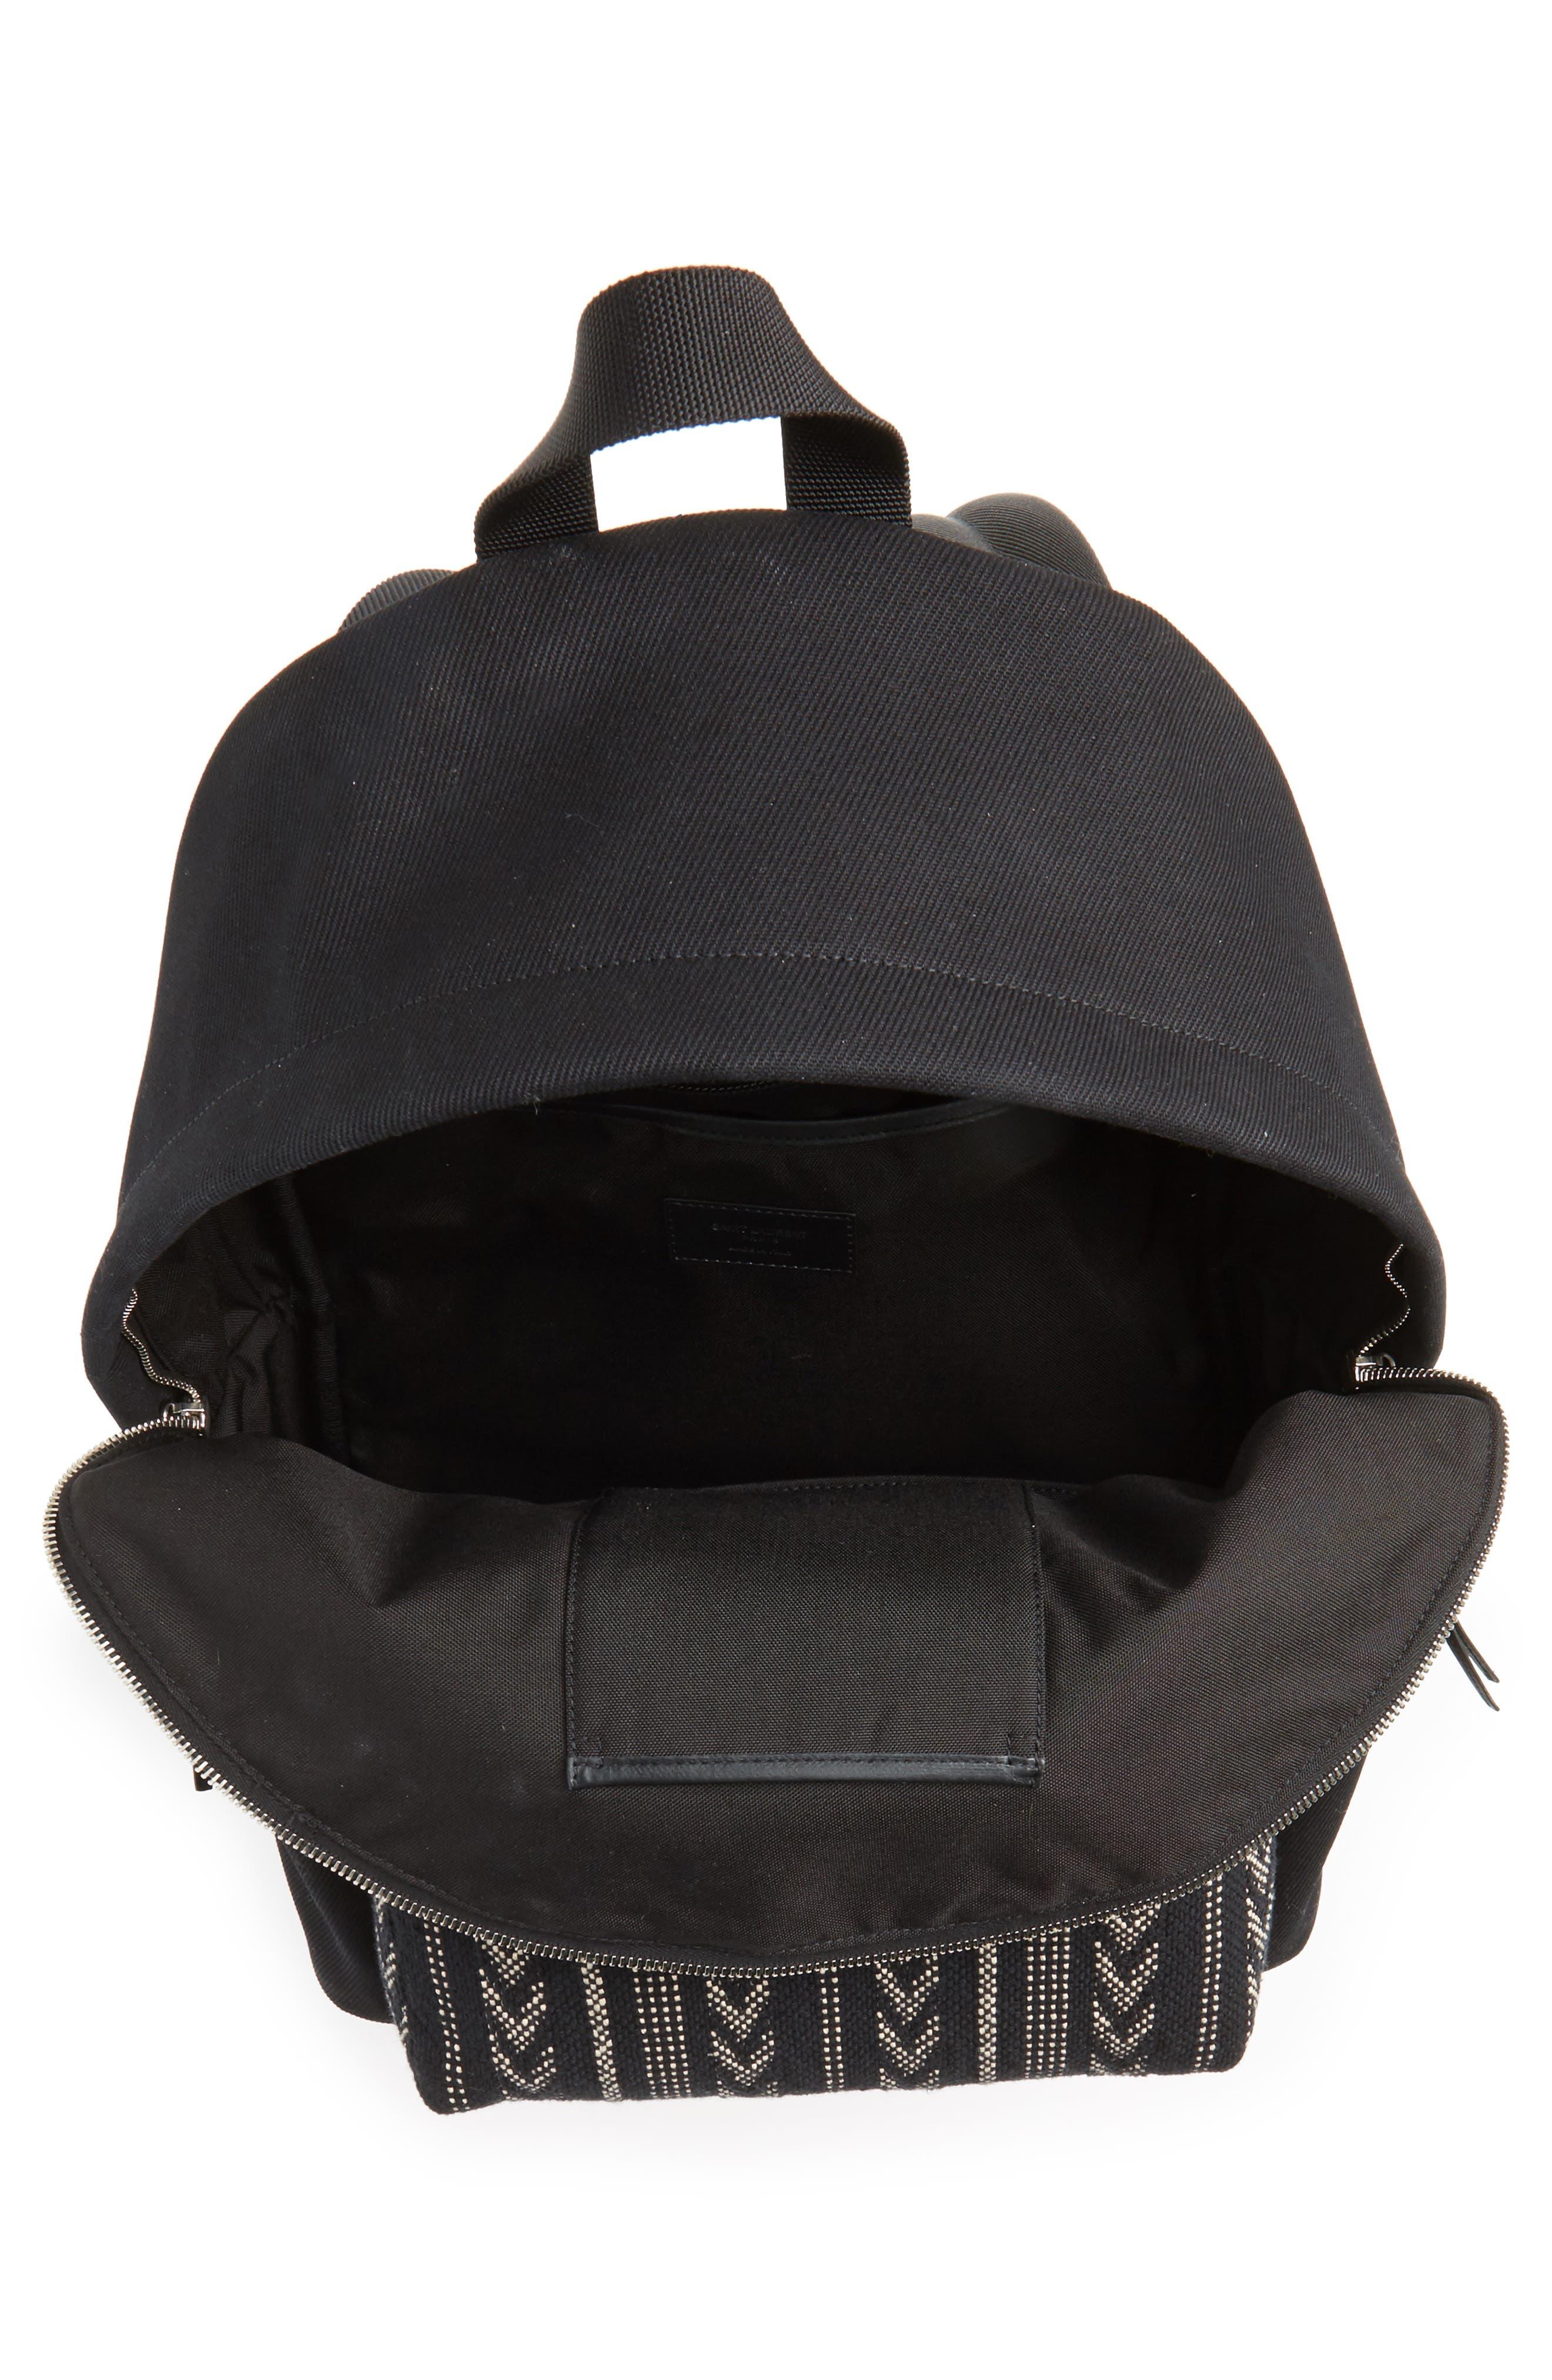 Pattern City Backpack,                             Alternate thumbnail 4, color,                             BLACK/ WHITE